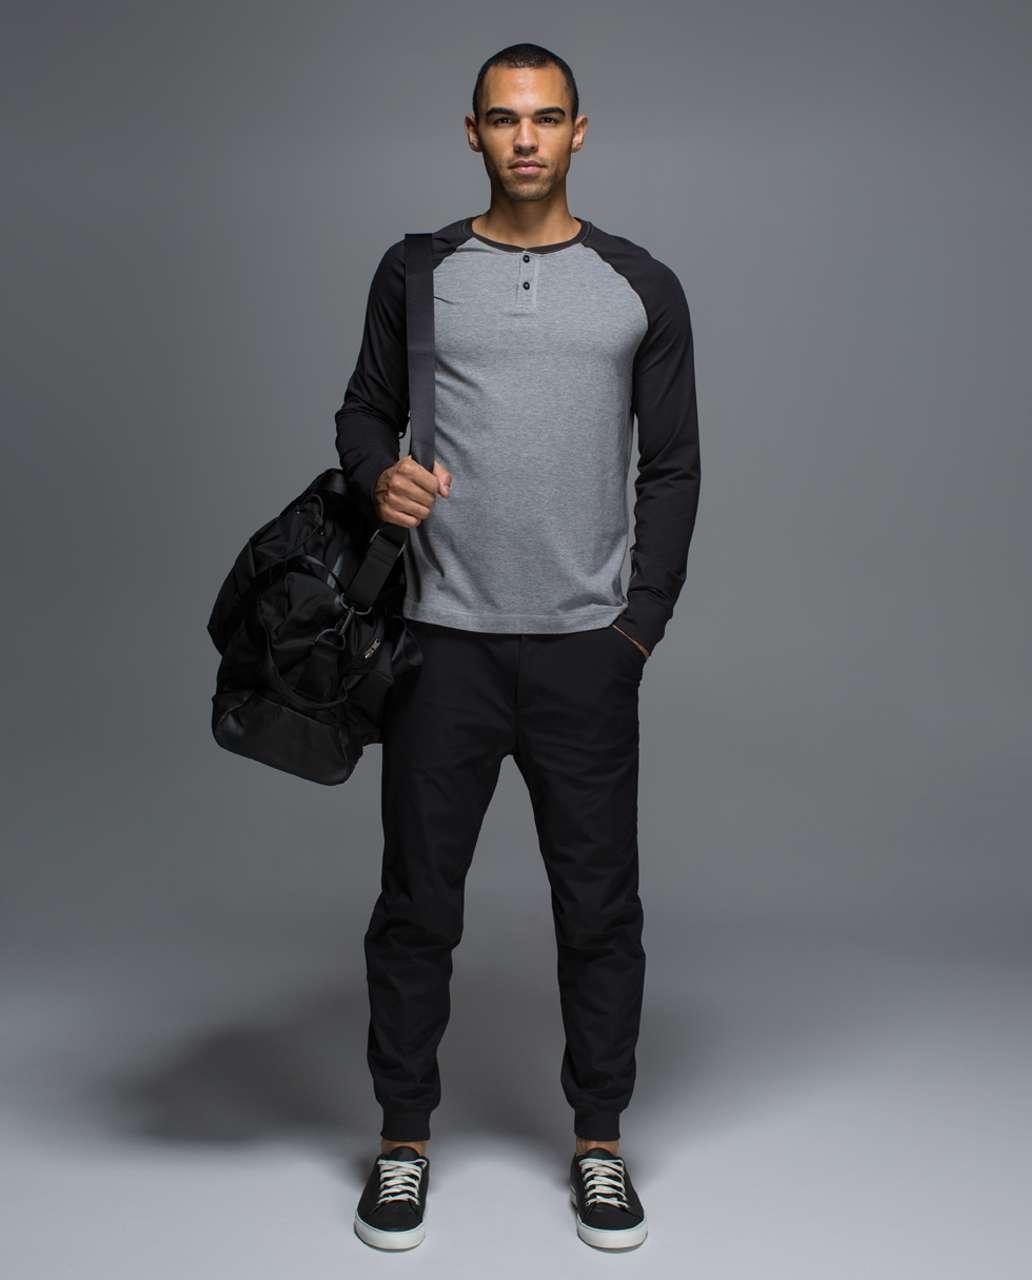 Lululemon Rival Long Sleeve - Heathered Medium Grey / Black